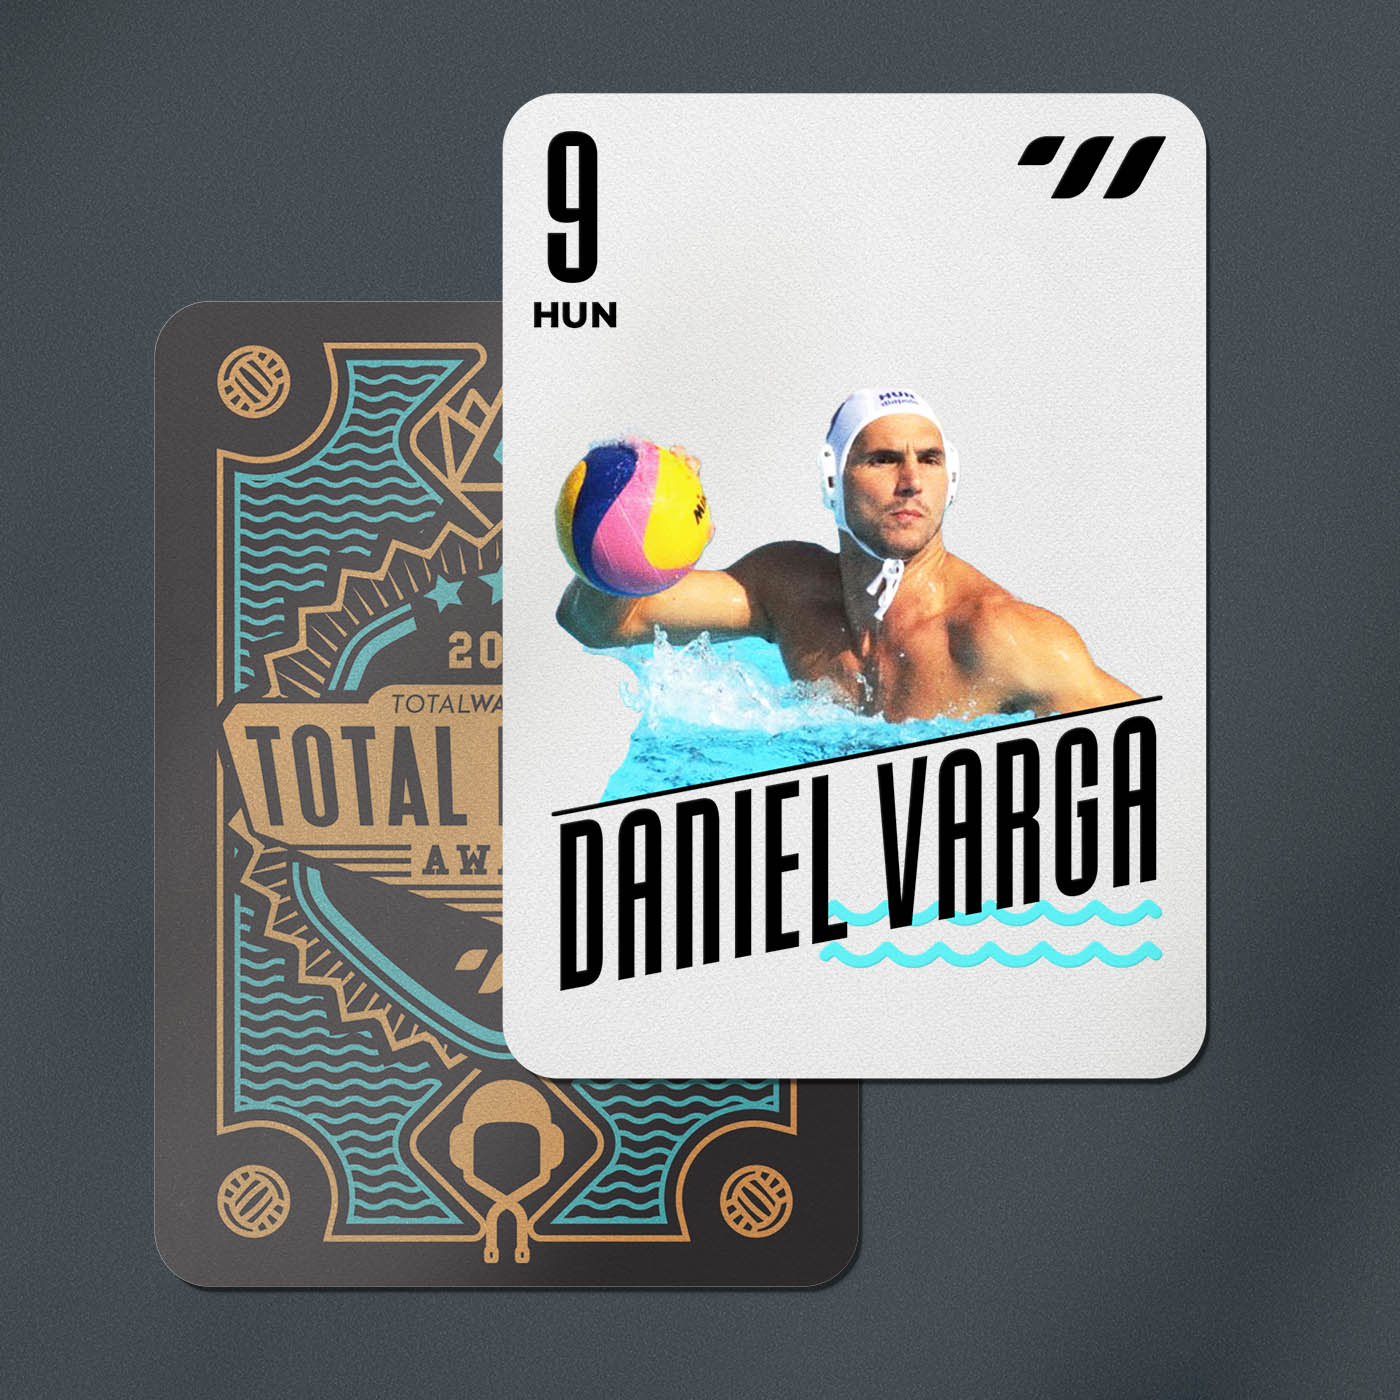 RIGHT SIDE - Daniel Varga (HUN)